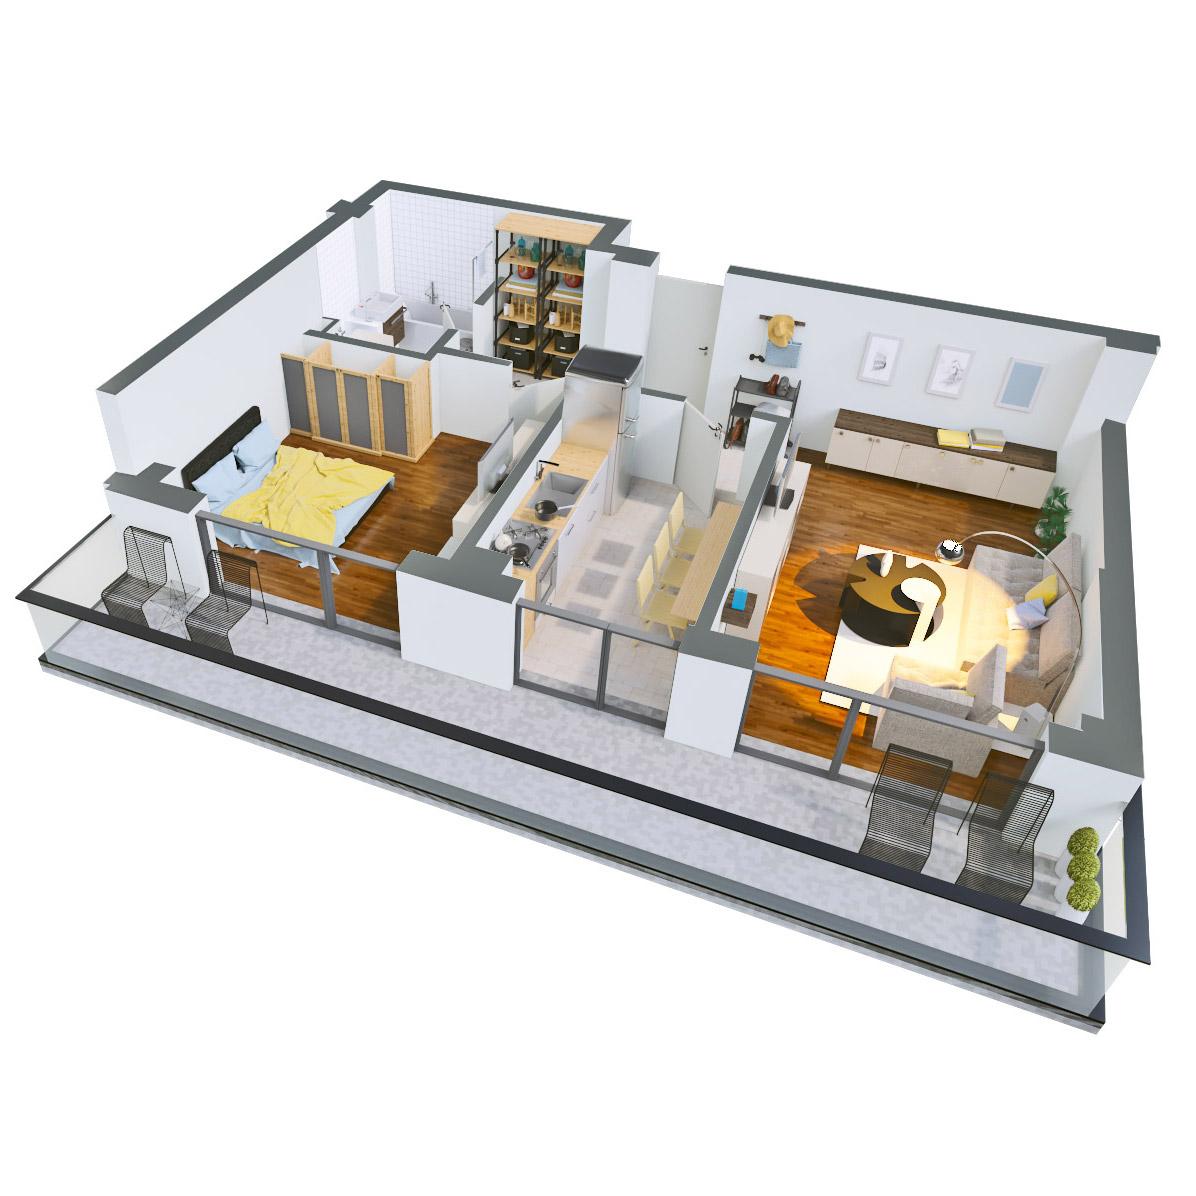 Apartament 2 camere de vanzare Bucuresti - Catedral Residence - Marriott, Piata Unirii, 13 Septembrie, Izvor - Tip 4 - T2A - B